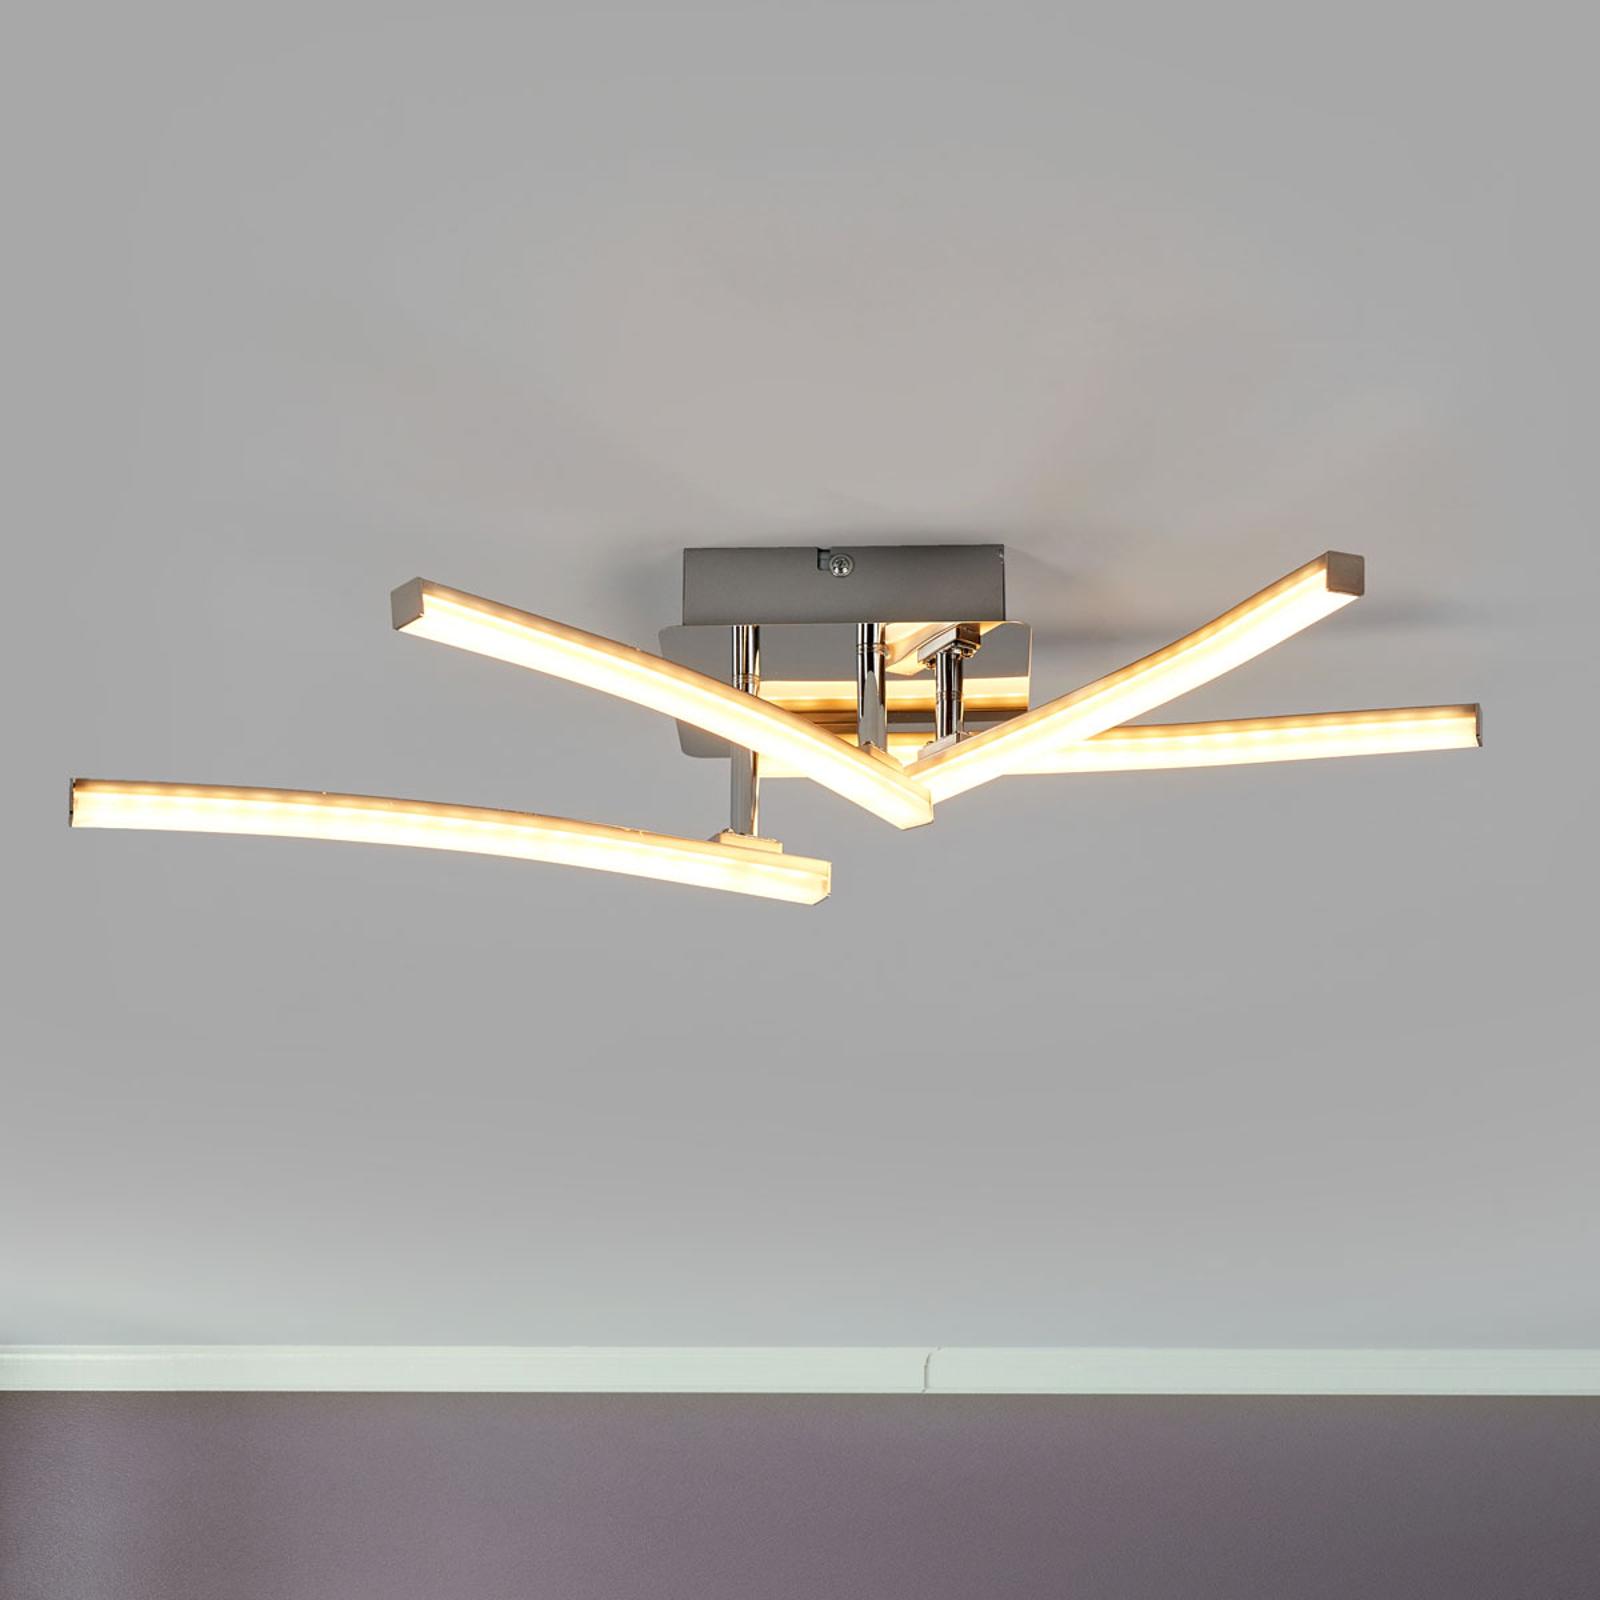 Lampa sufitowa LED Simon z obracanymi ramionami